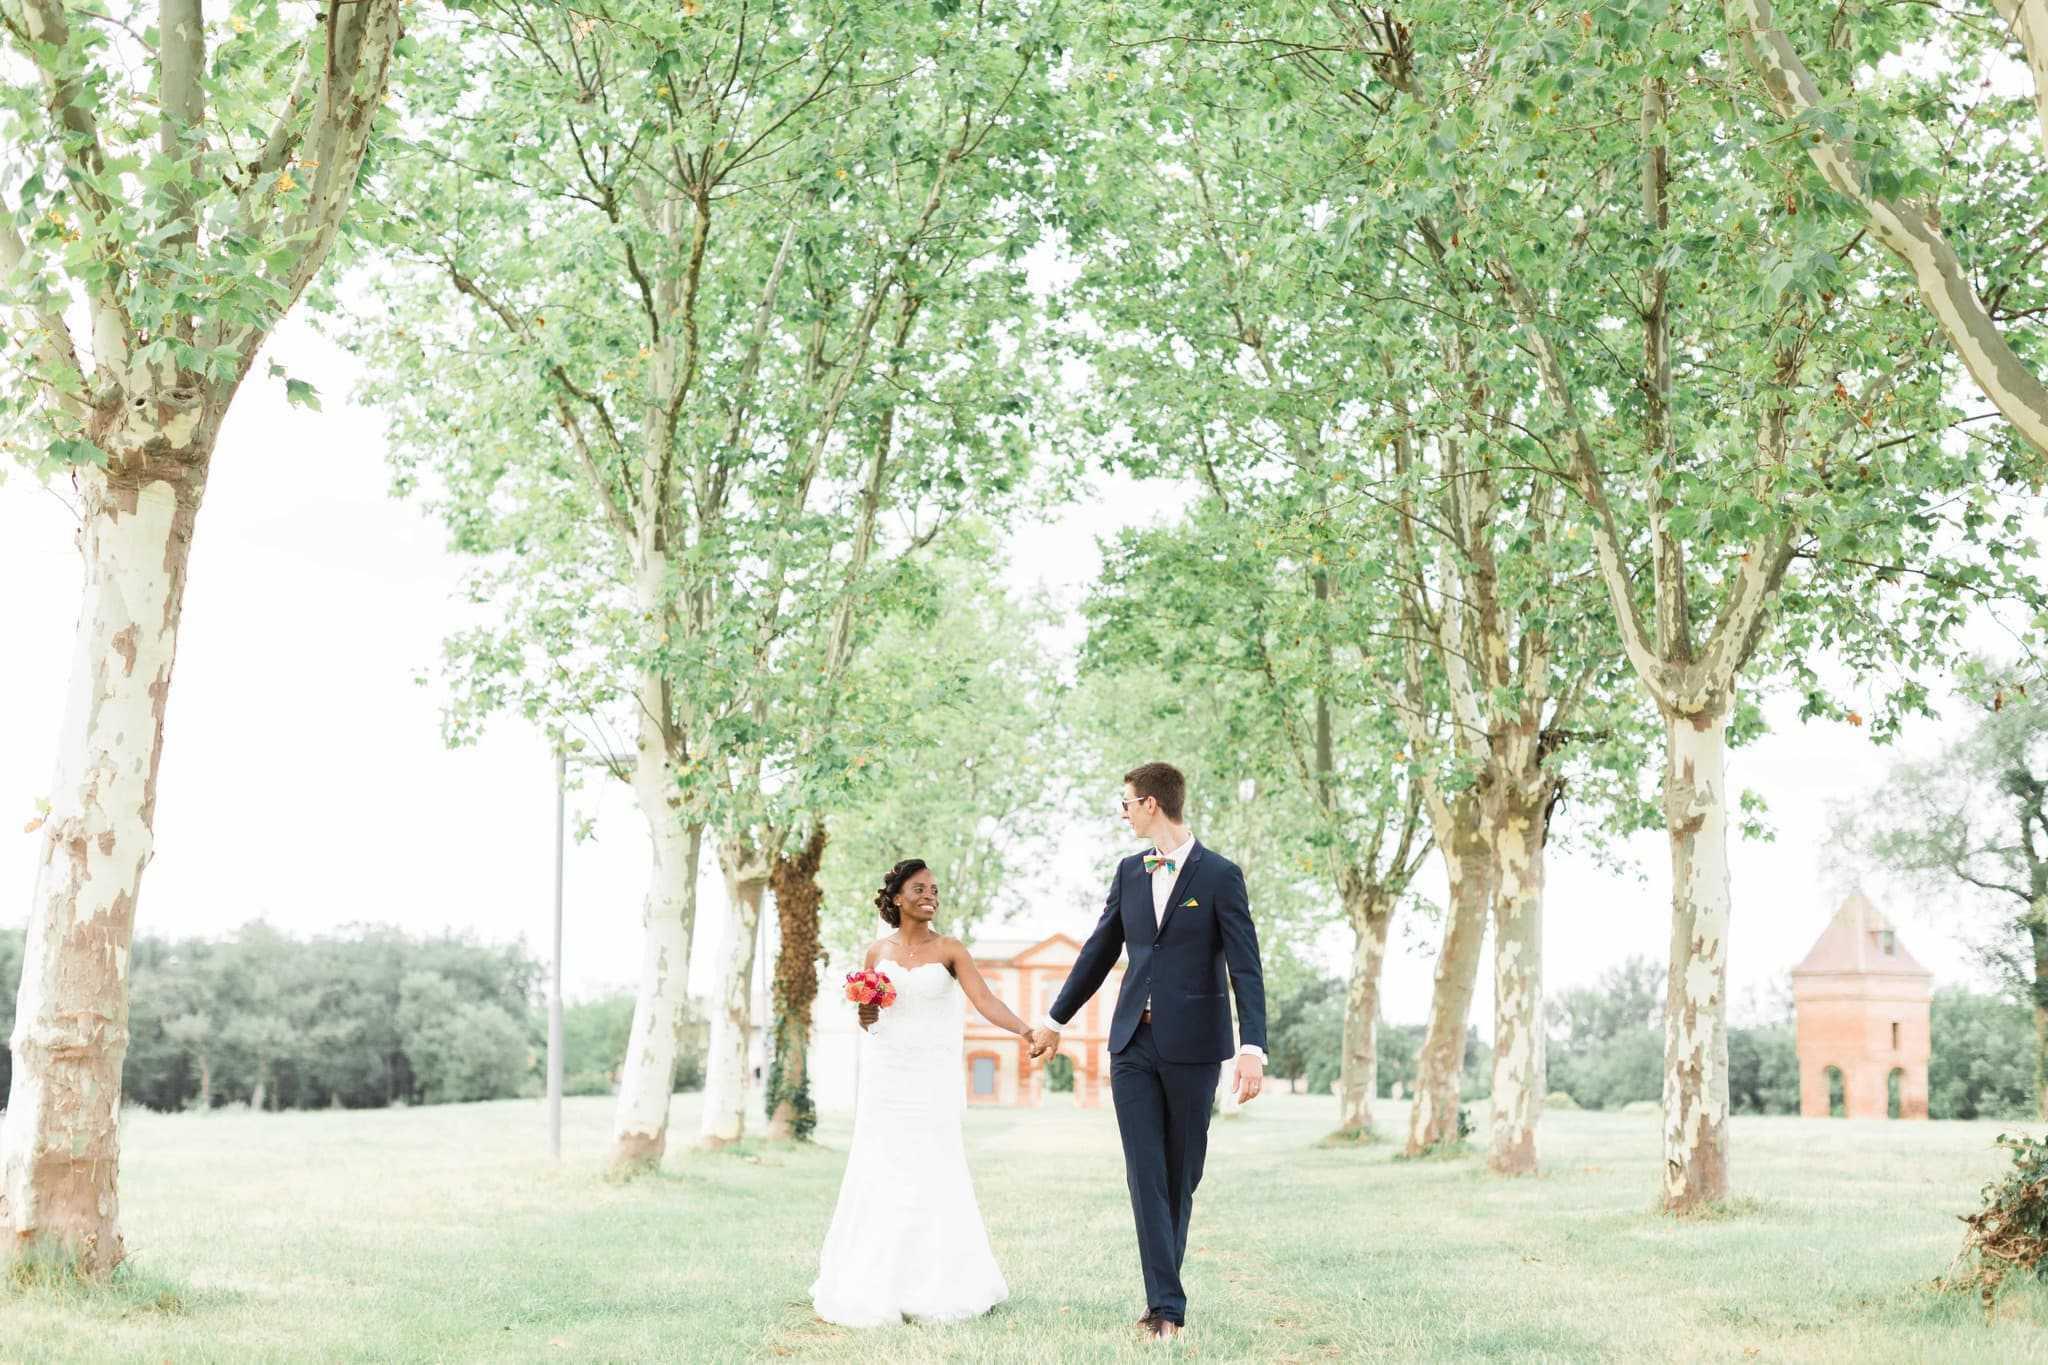 Guillaume Gimenez / toulouse / photographe mariage / destination wedding photographer